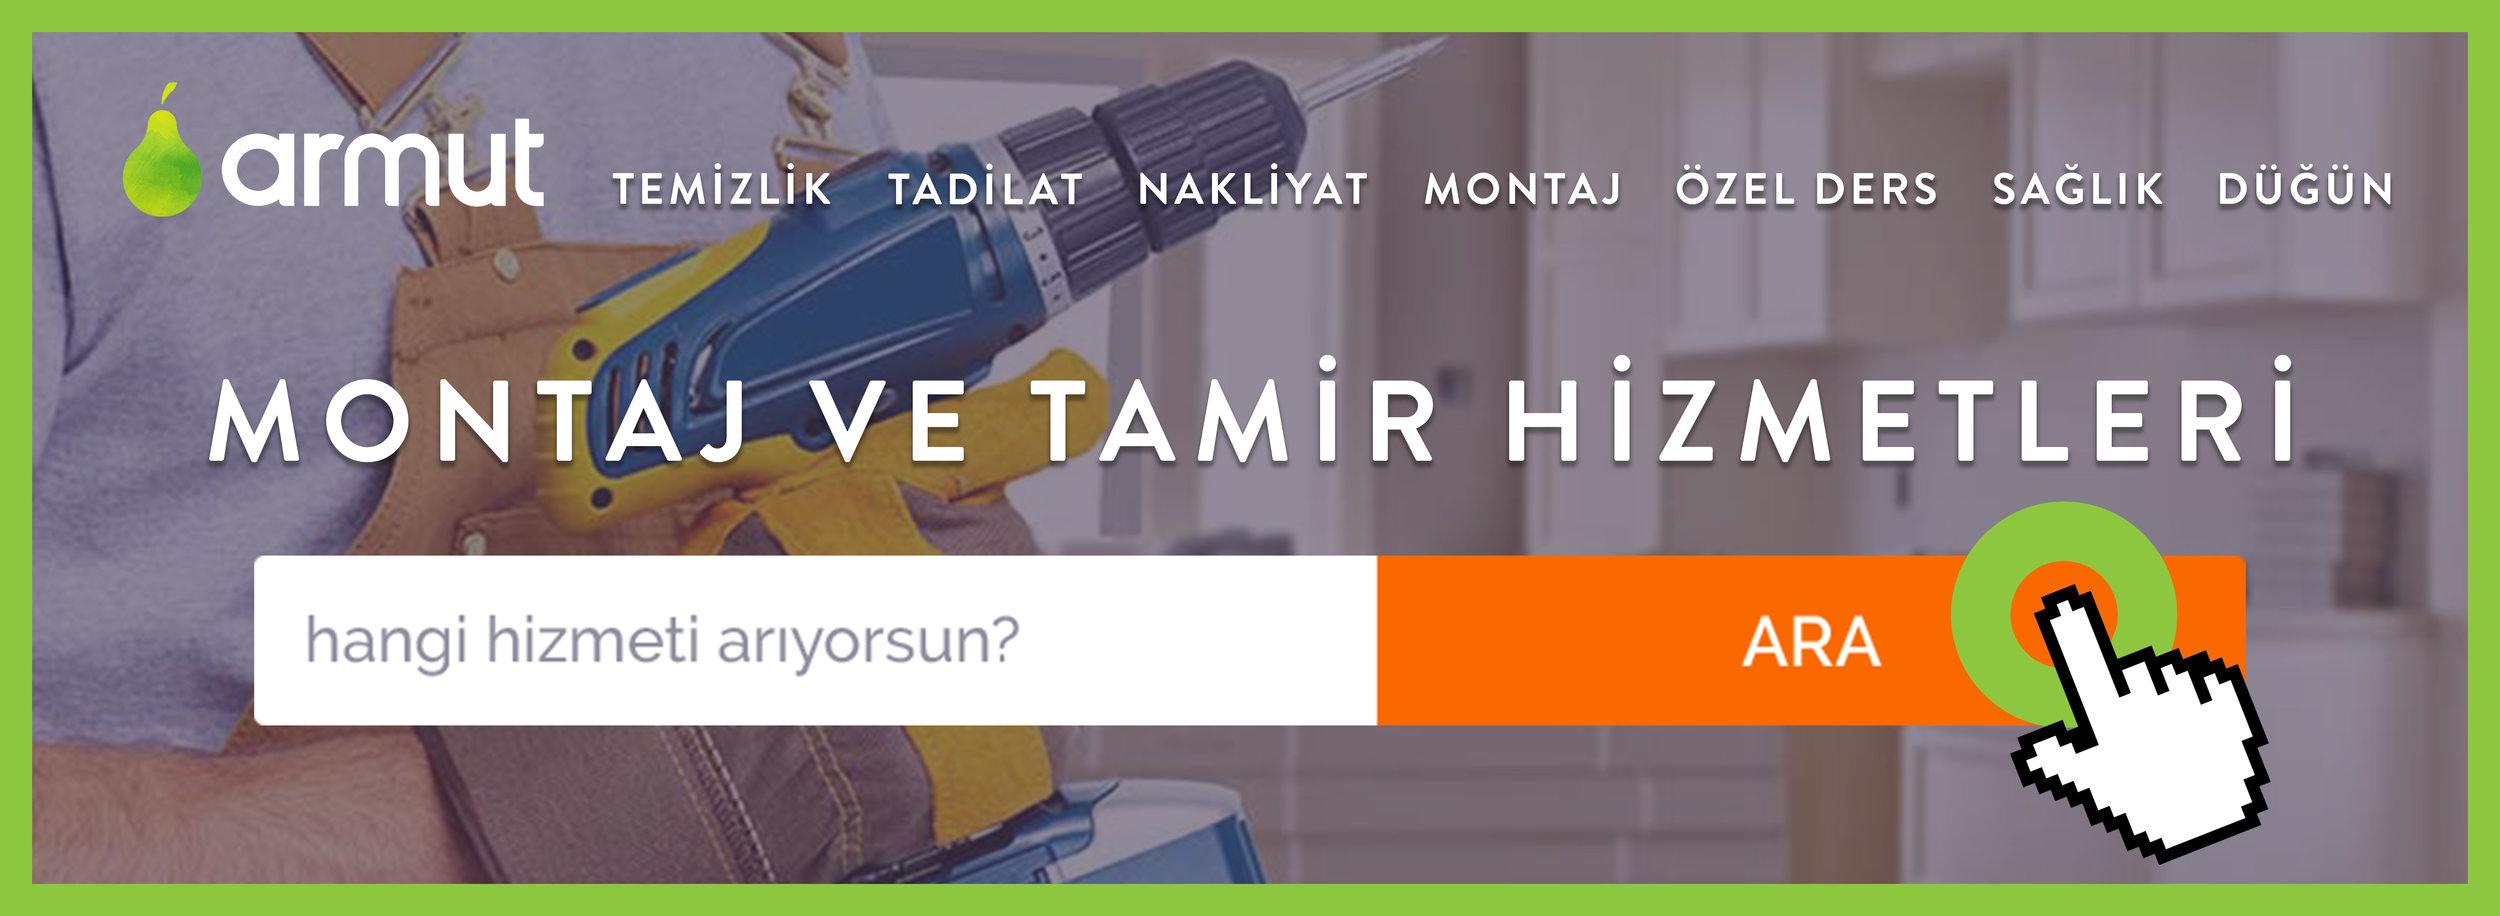 armut.com-tamir